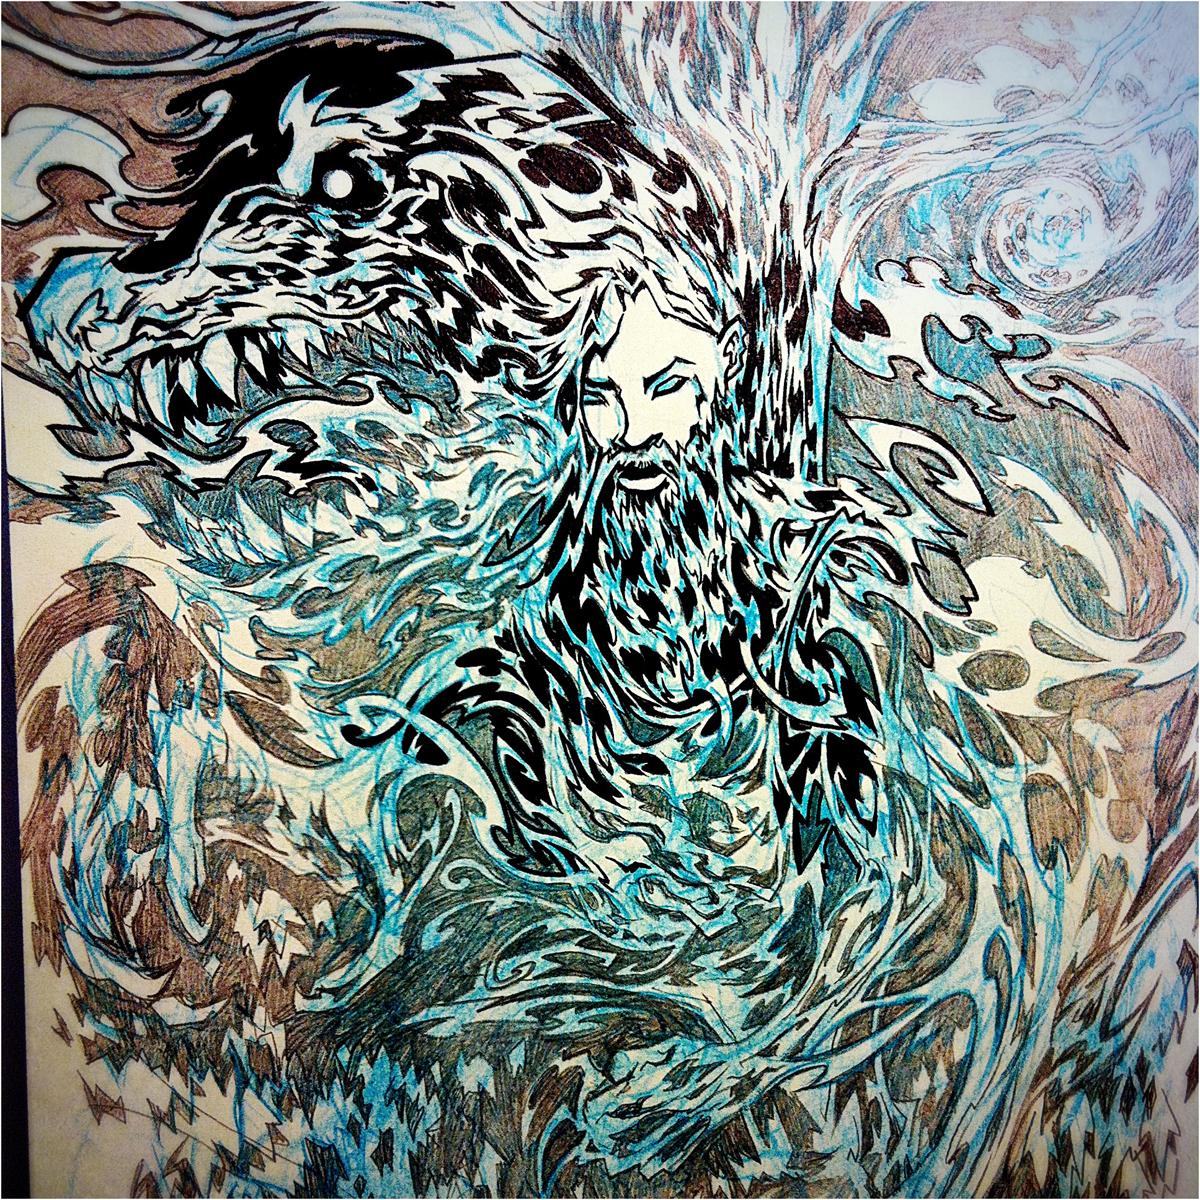 Inking.